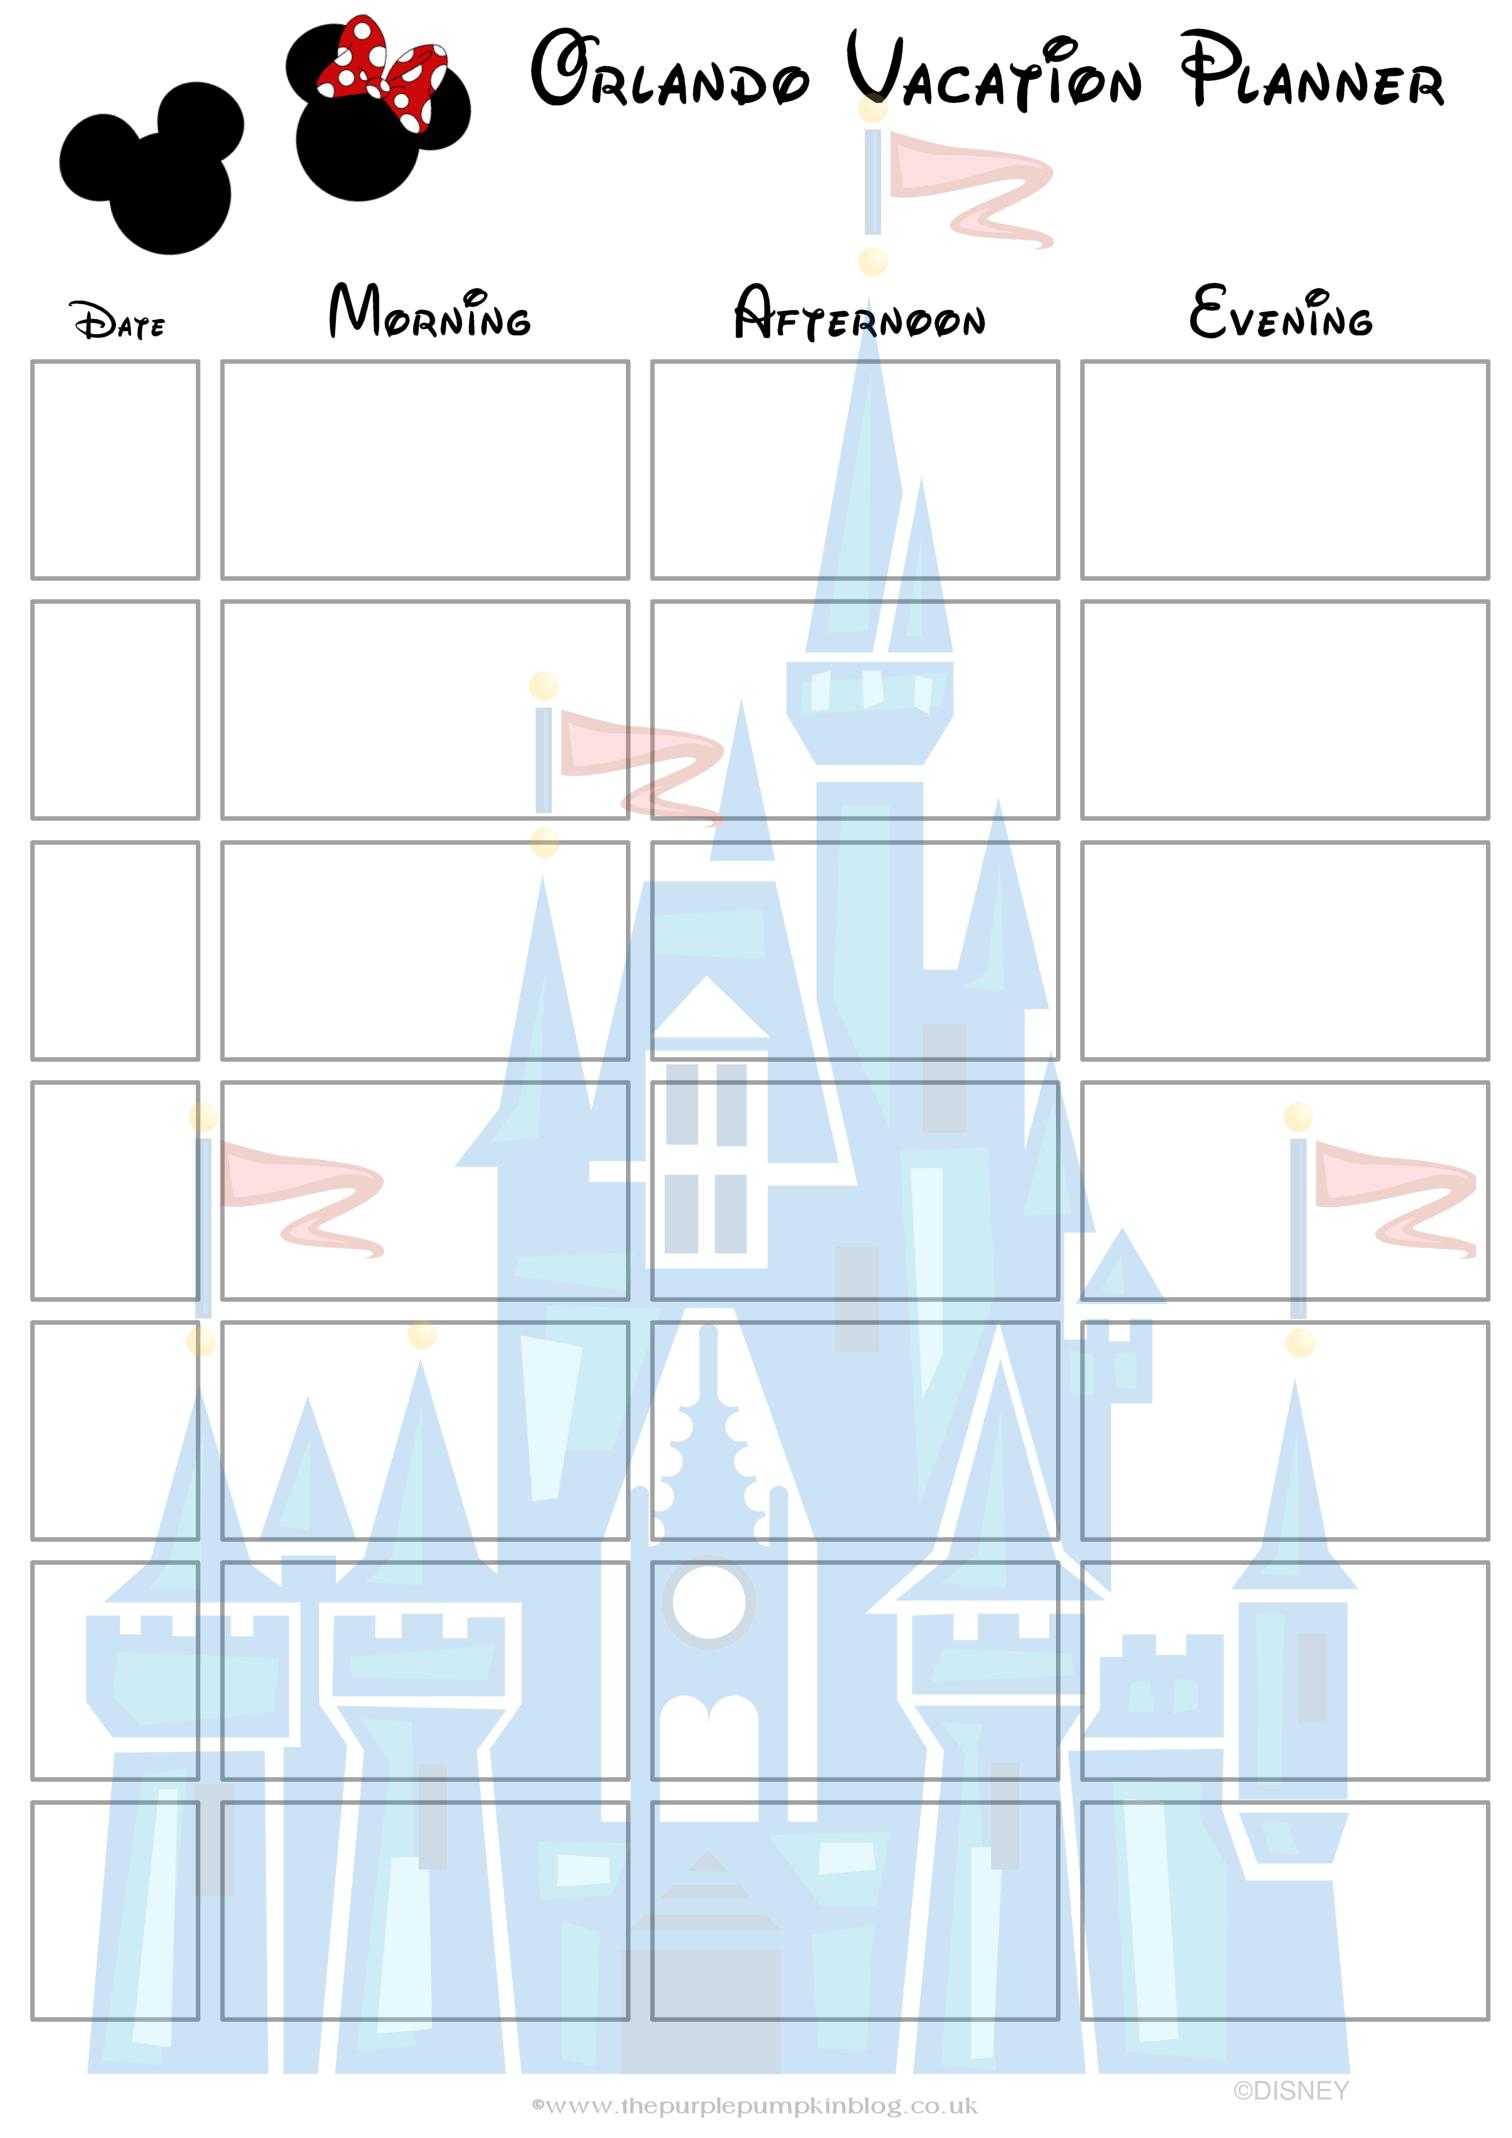 Orlando Walt Disney World Vacation Planner  Free